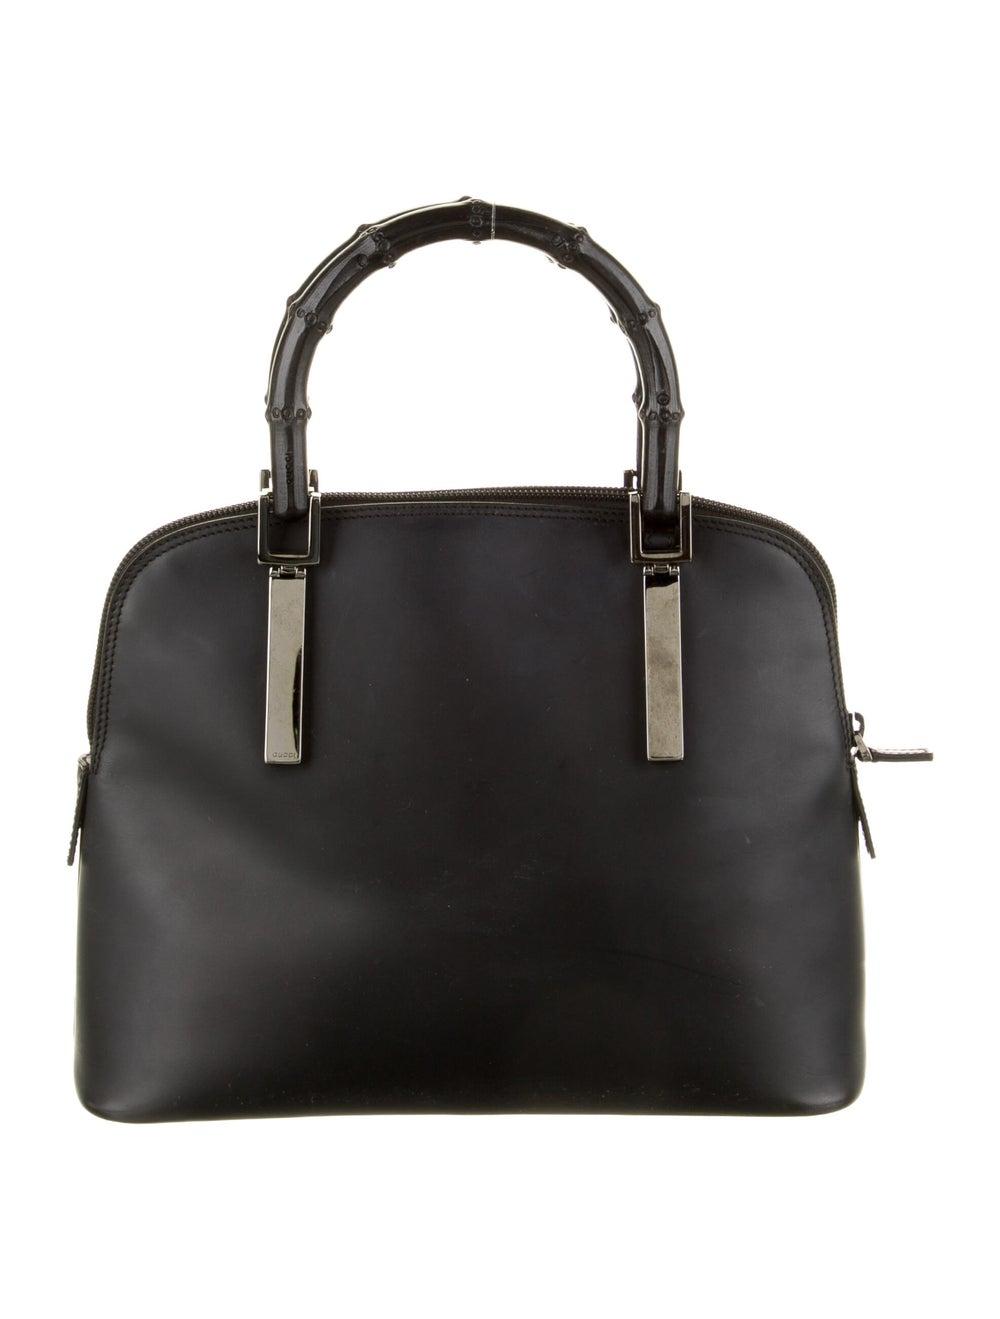 Gucci Bamboo Top Handle Bag Black - image 4